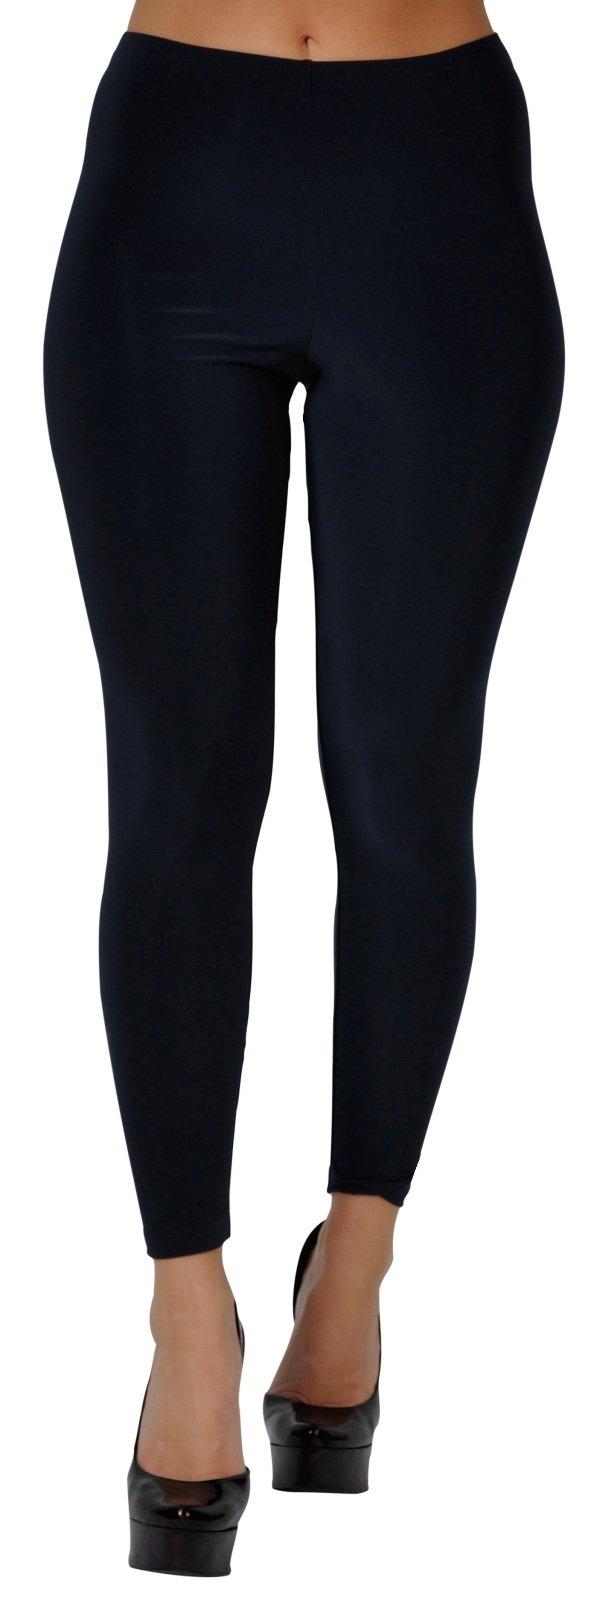 Sympli Womens Leggings style 2742 Size 12 Navy by Sympli